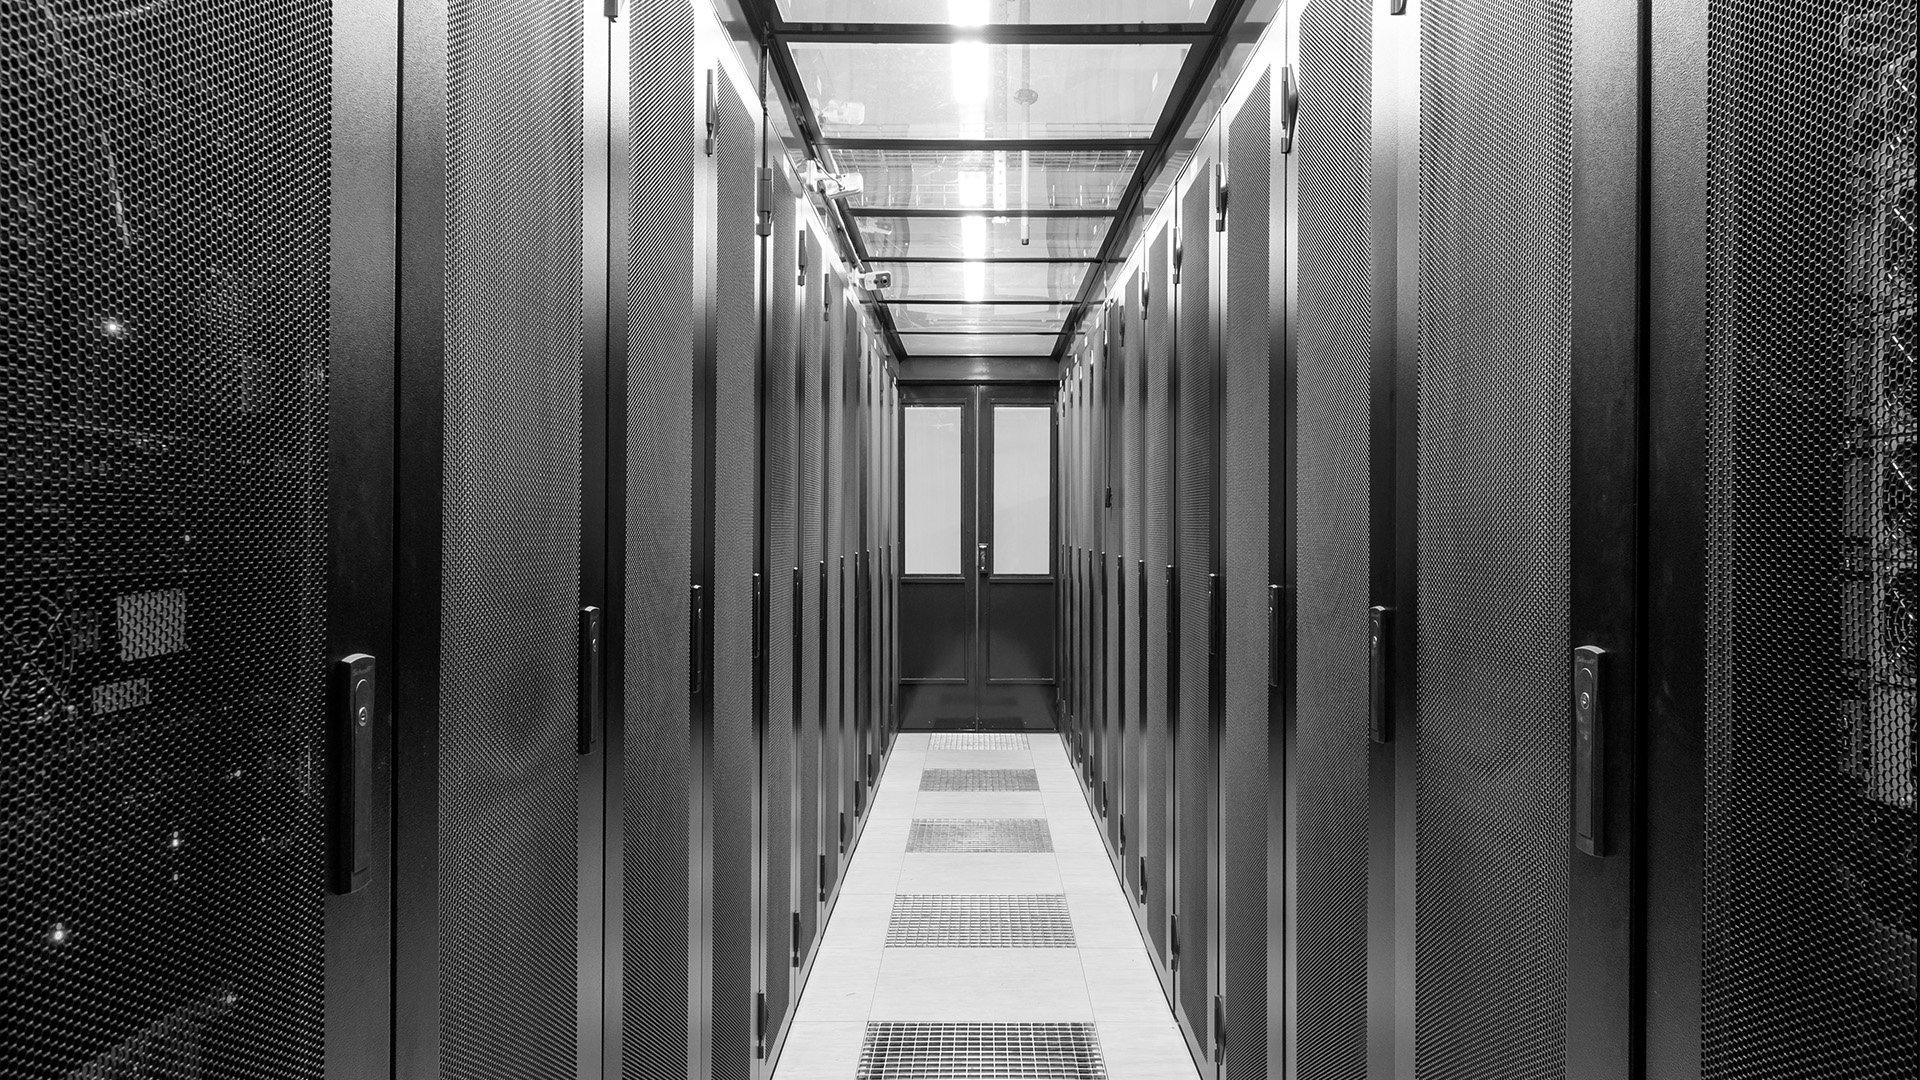 Home second rack corridor